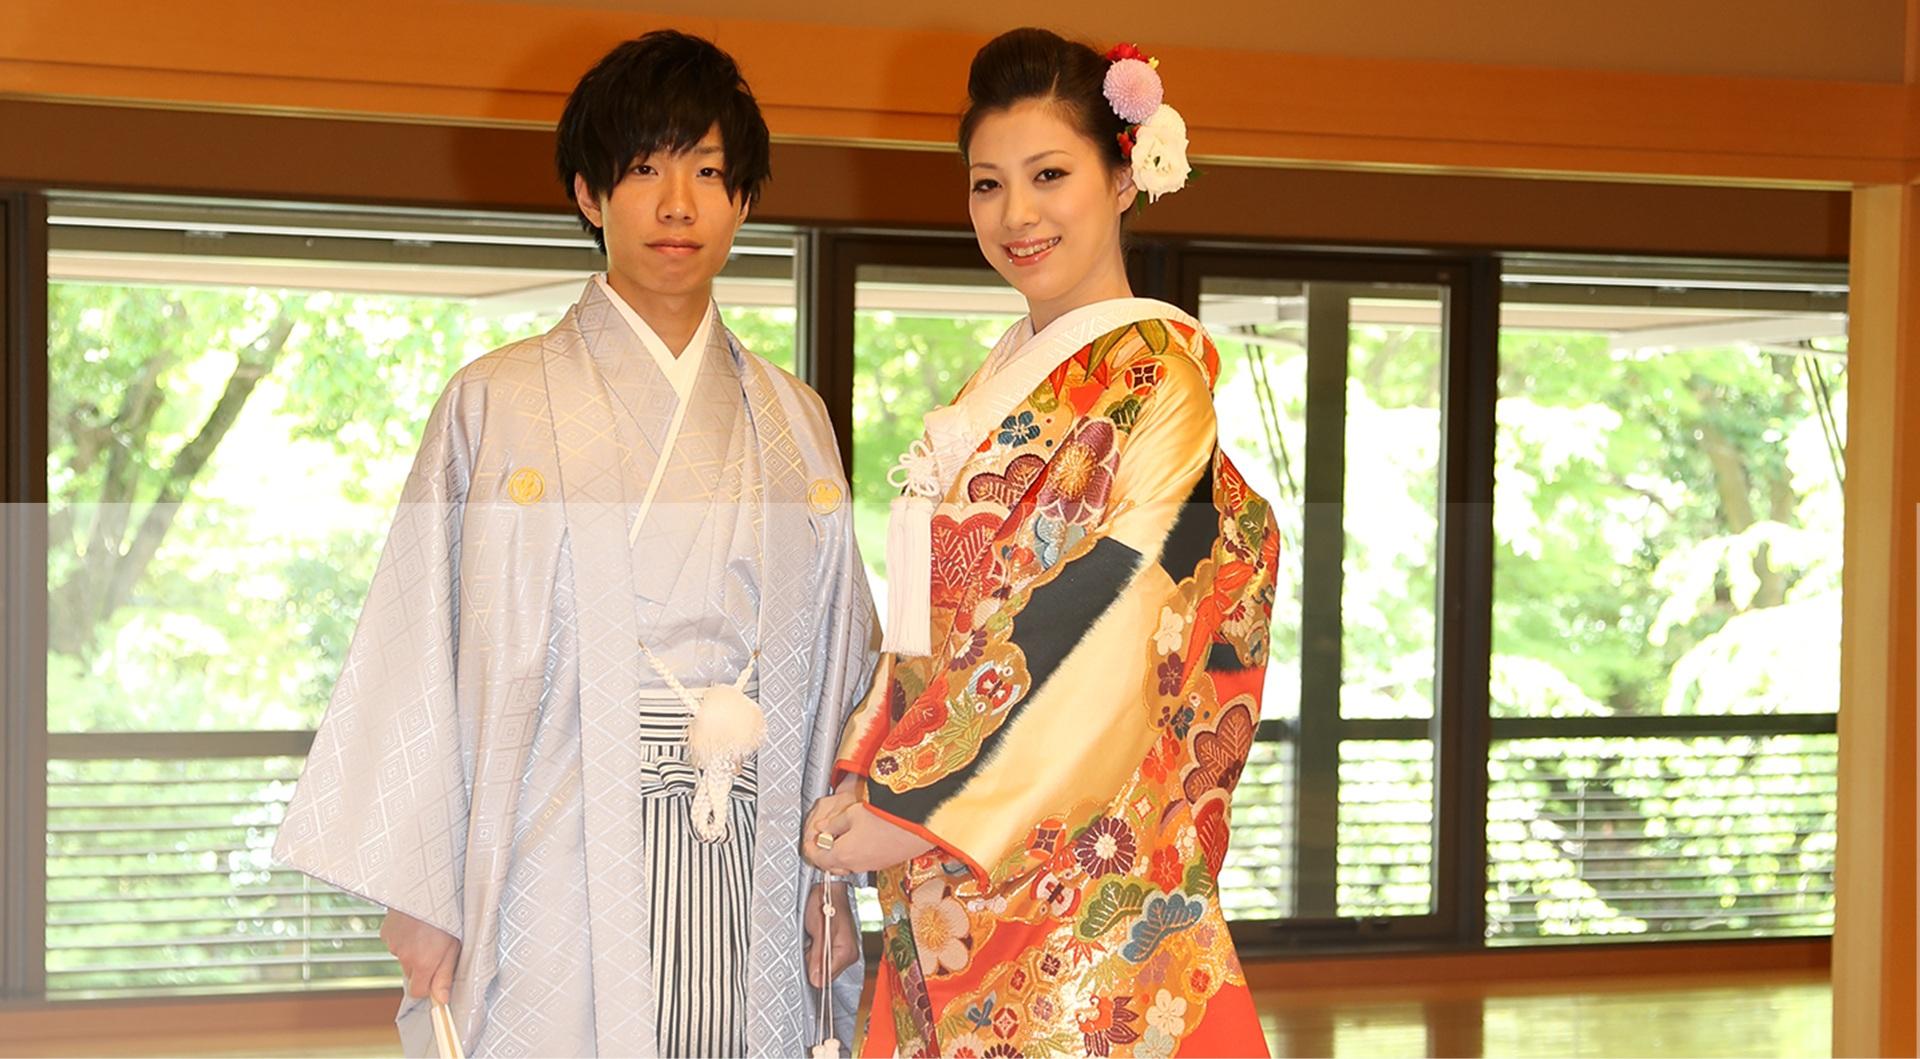 JAPANESE WEDDING 和装婚礼